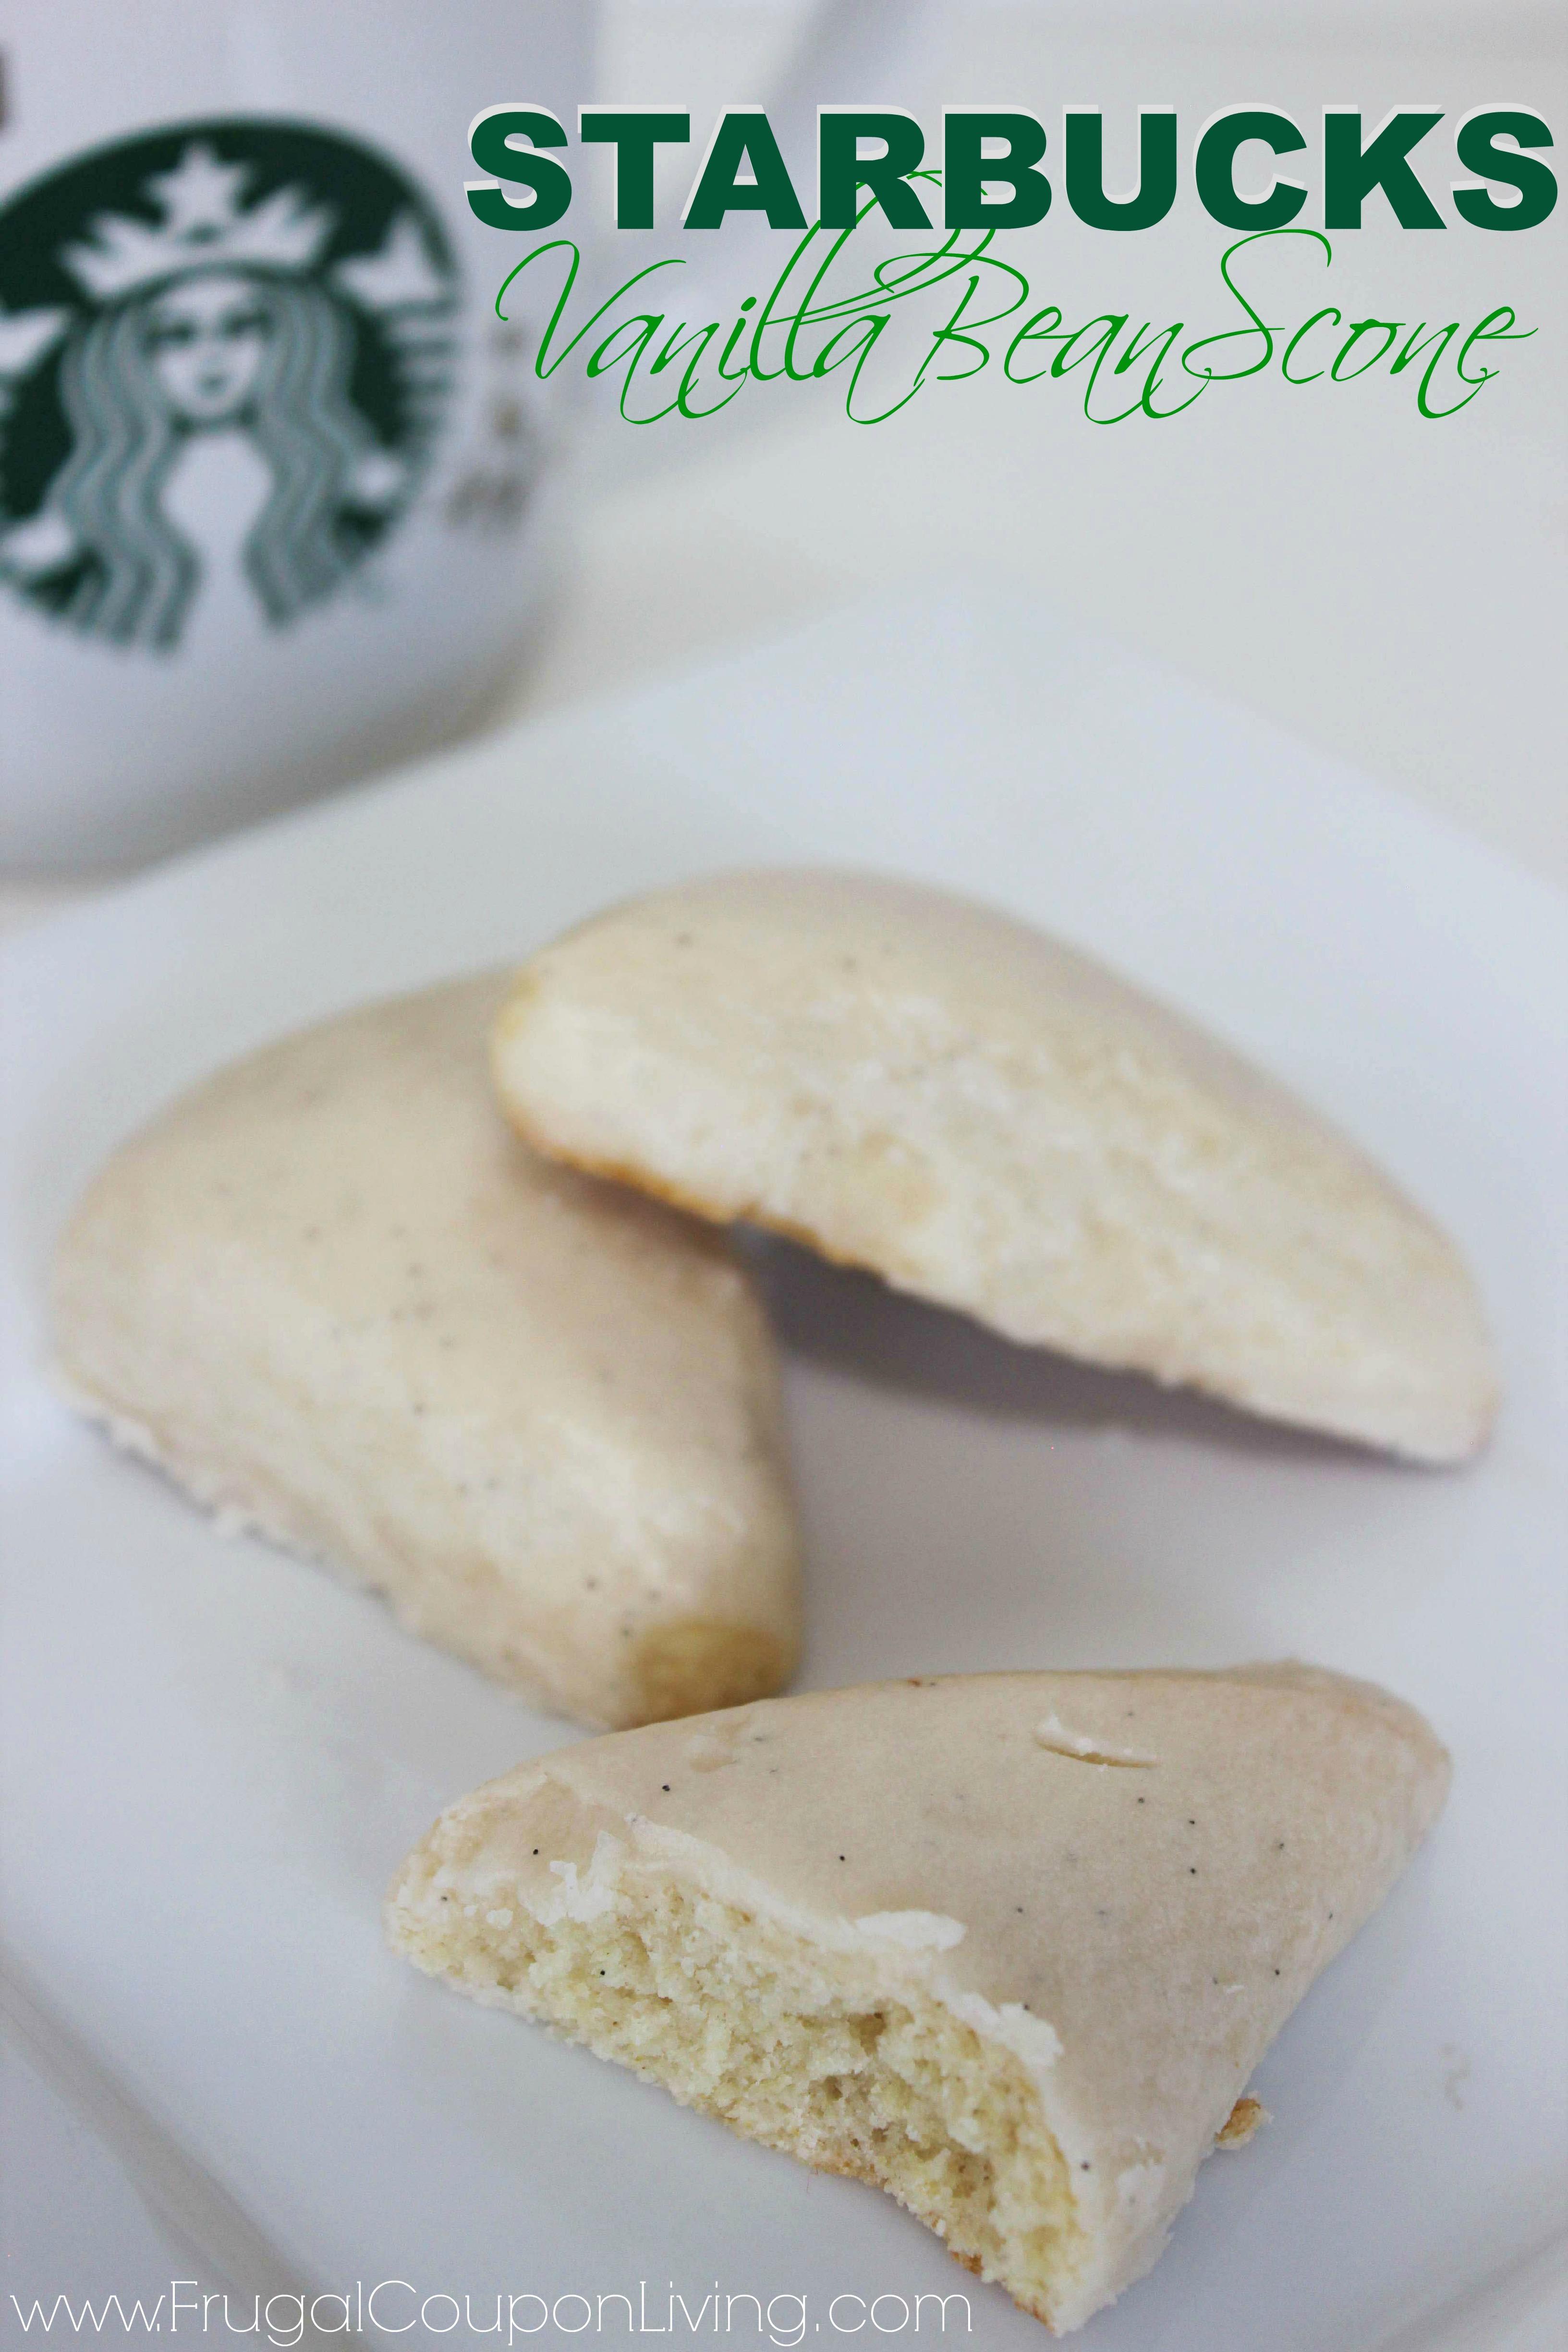 Starbucks-vanilla-bean-scone-frugal-coupon-living